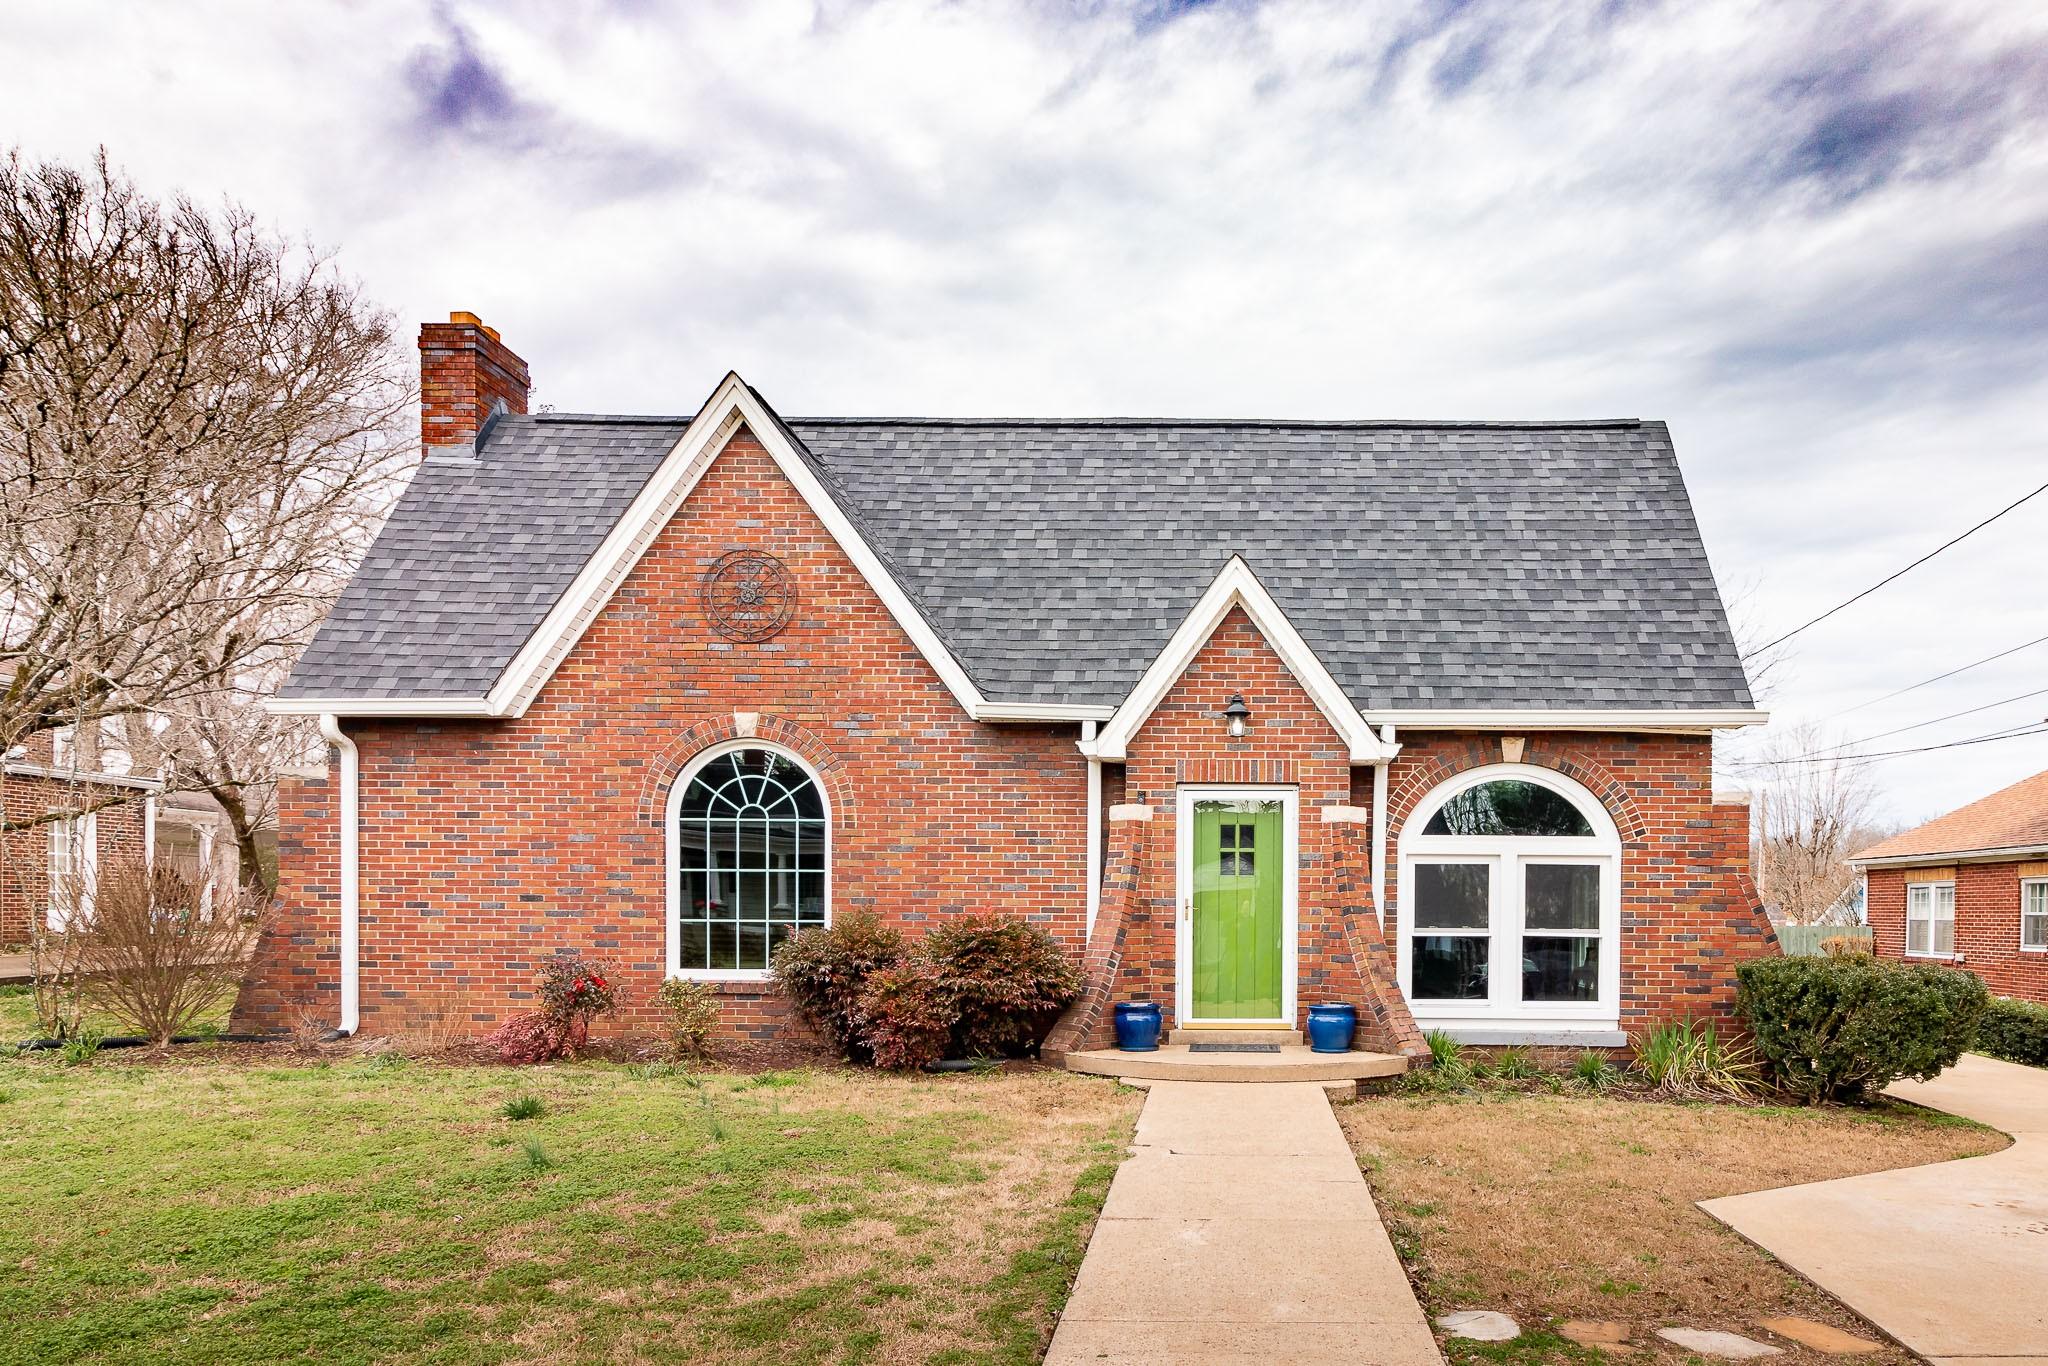 452 Highland Ave, Pulaski, TN 38478 - Pulaski, TN real estate listing